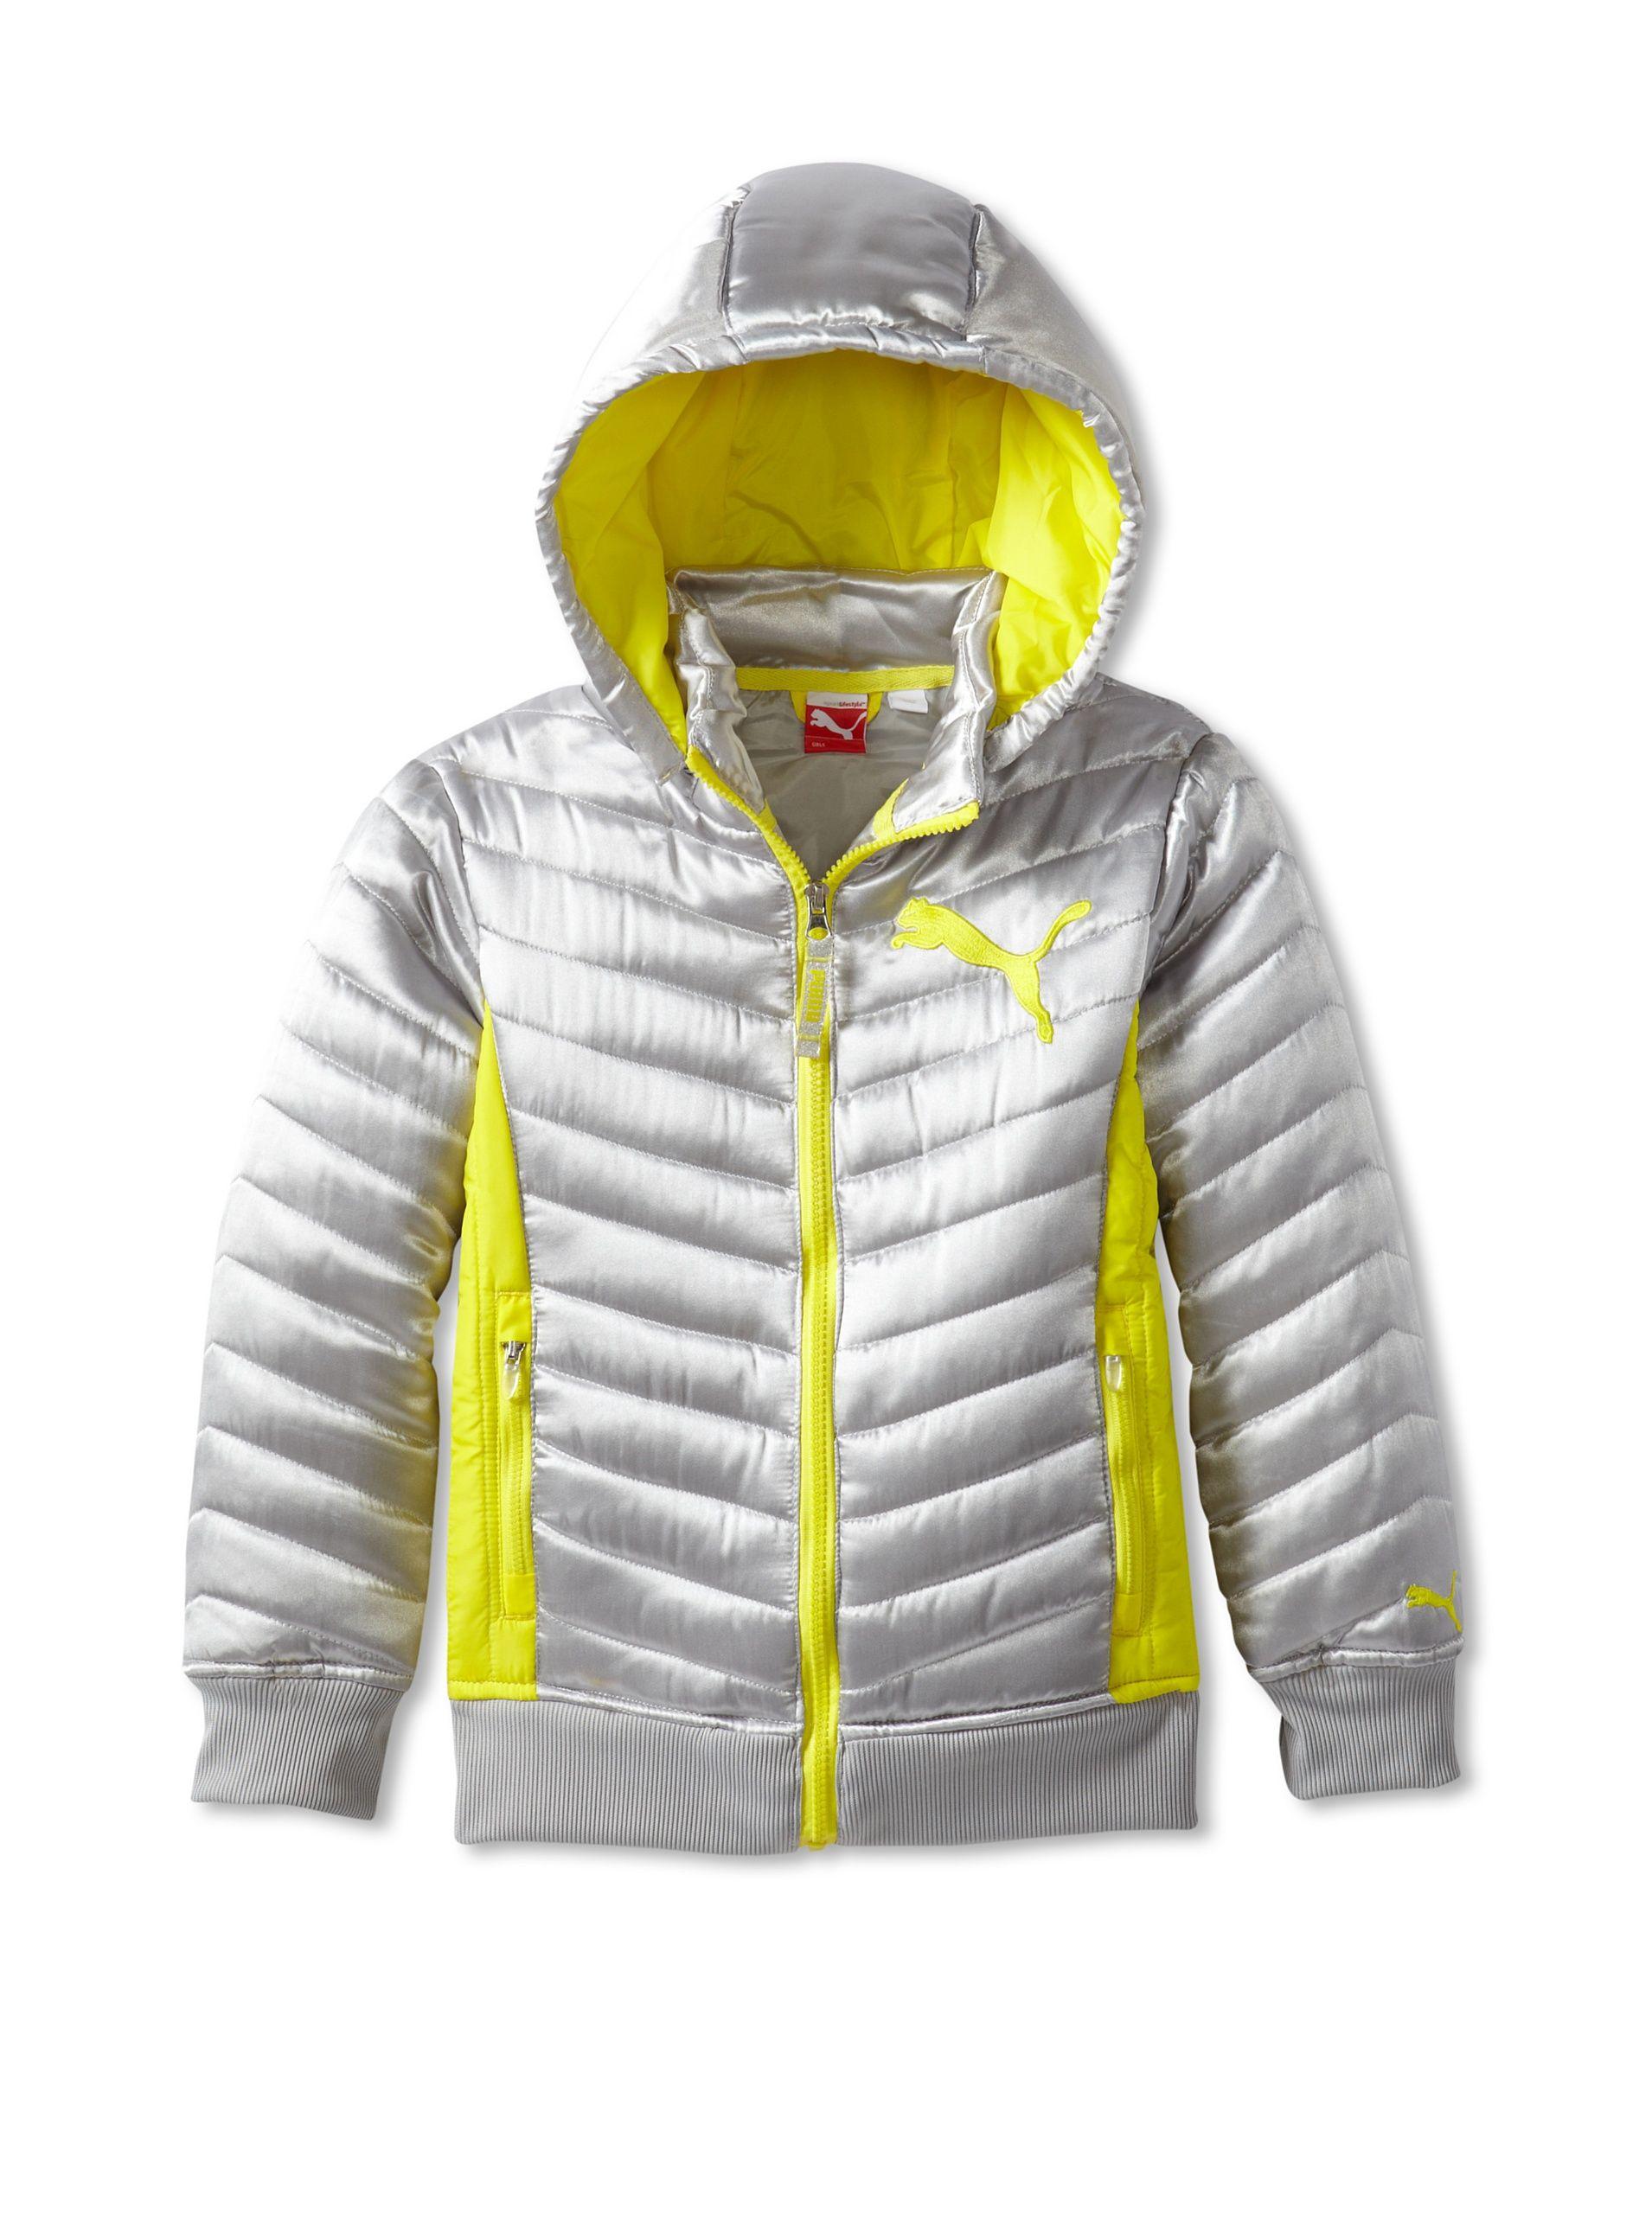 Puma Girl Quilted Puffer Jacket Trim Jacket Girls Outerwear [ 2560 x 1910 Pixel ]